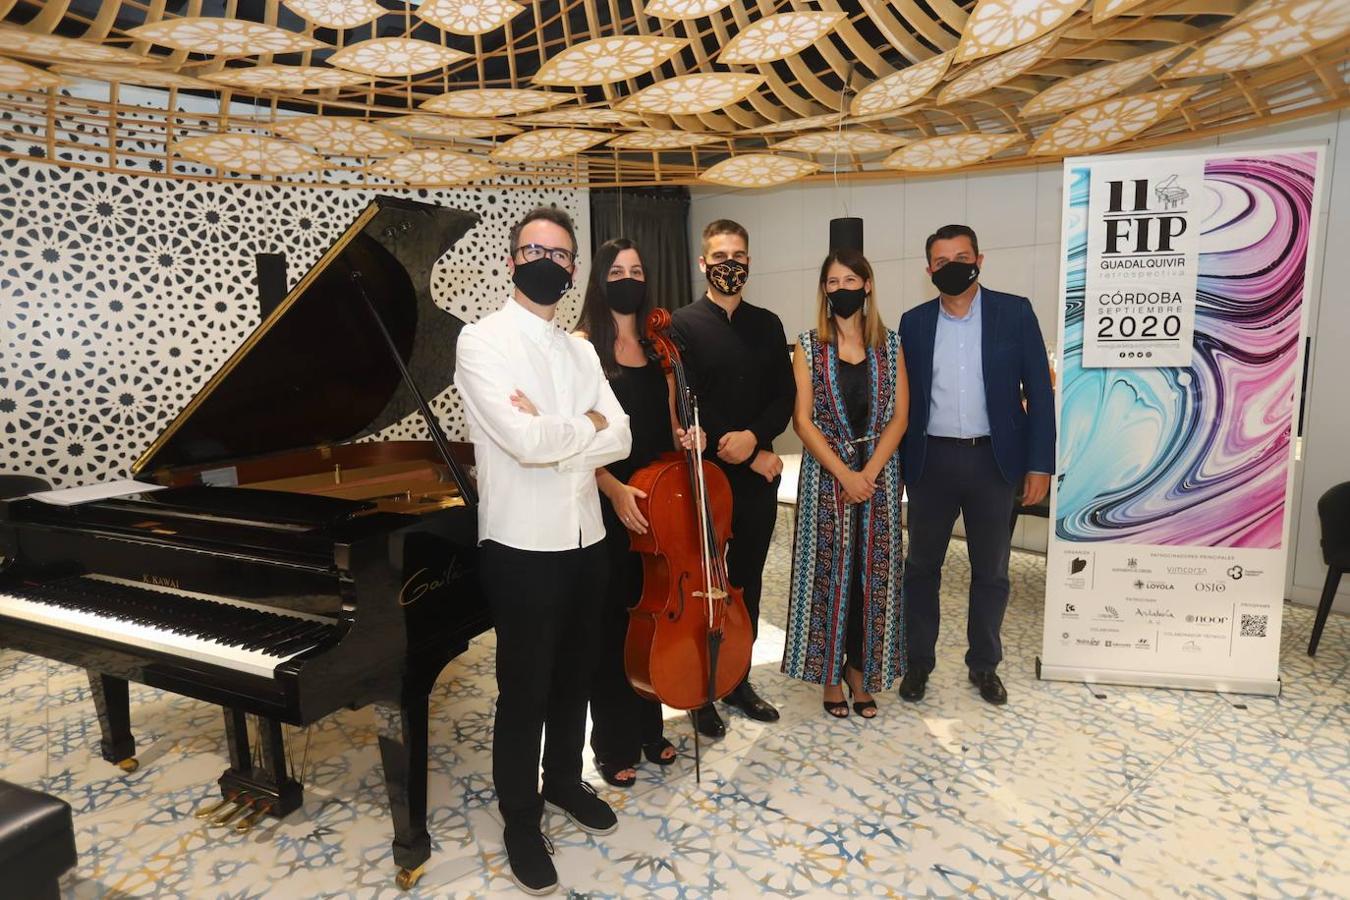 festival-internacional-piano-guadalquivir